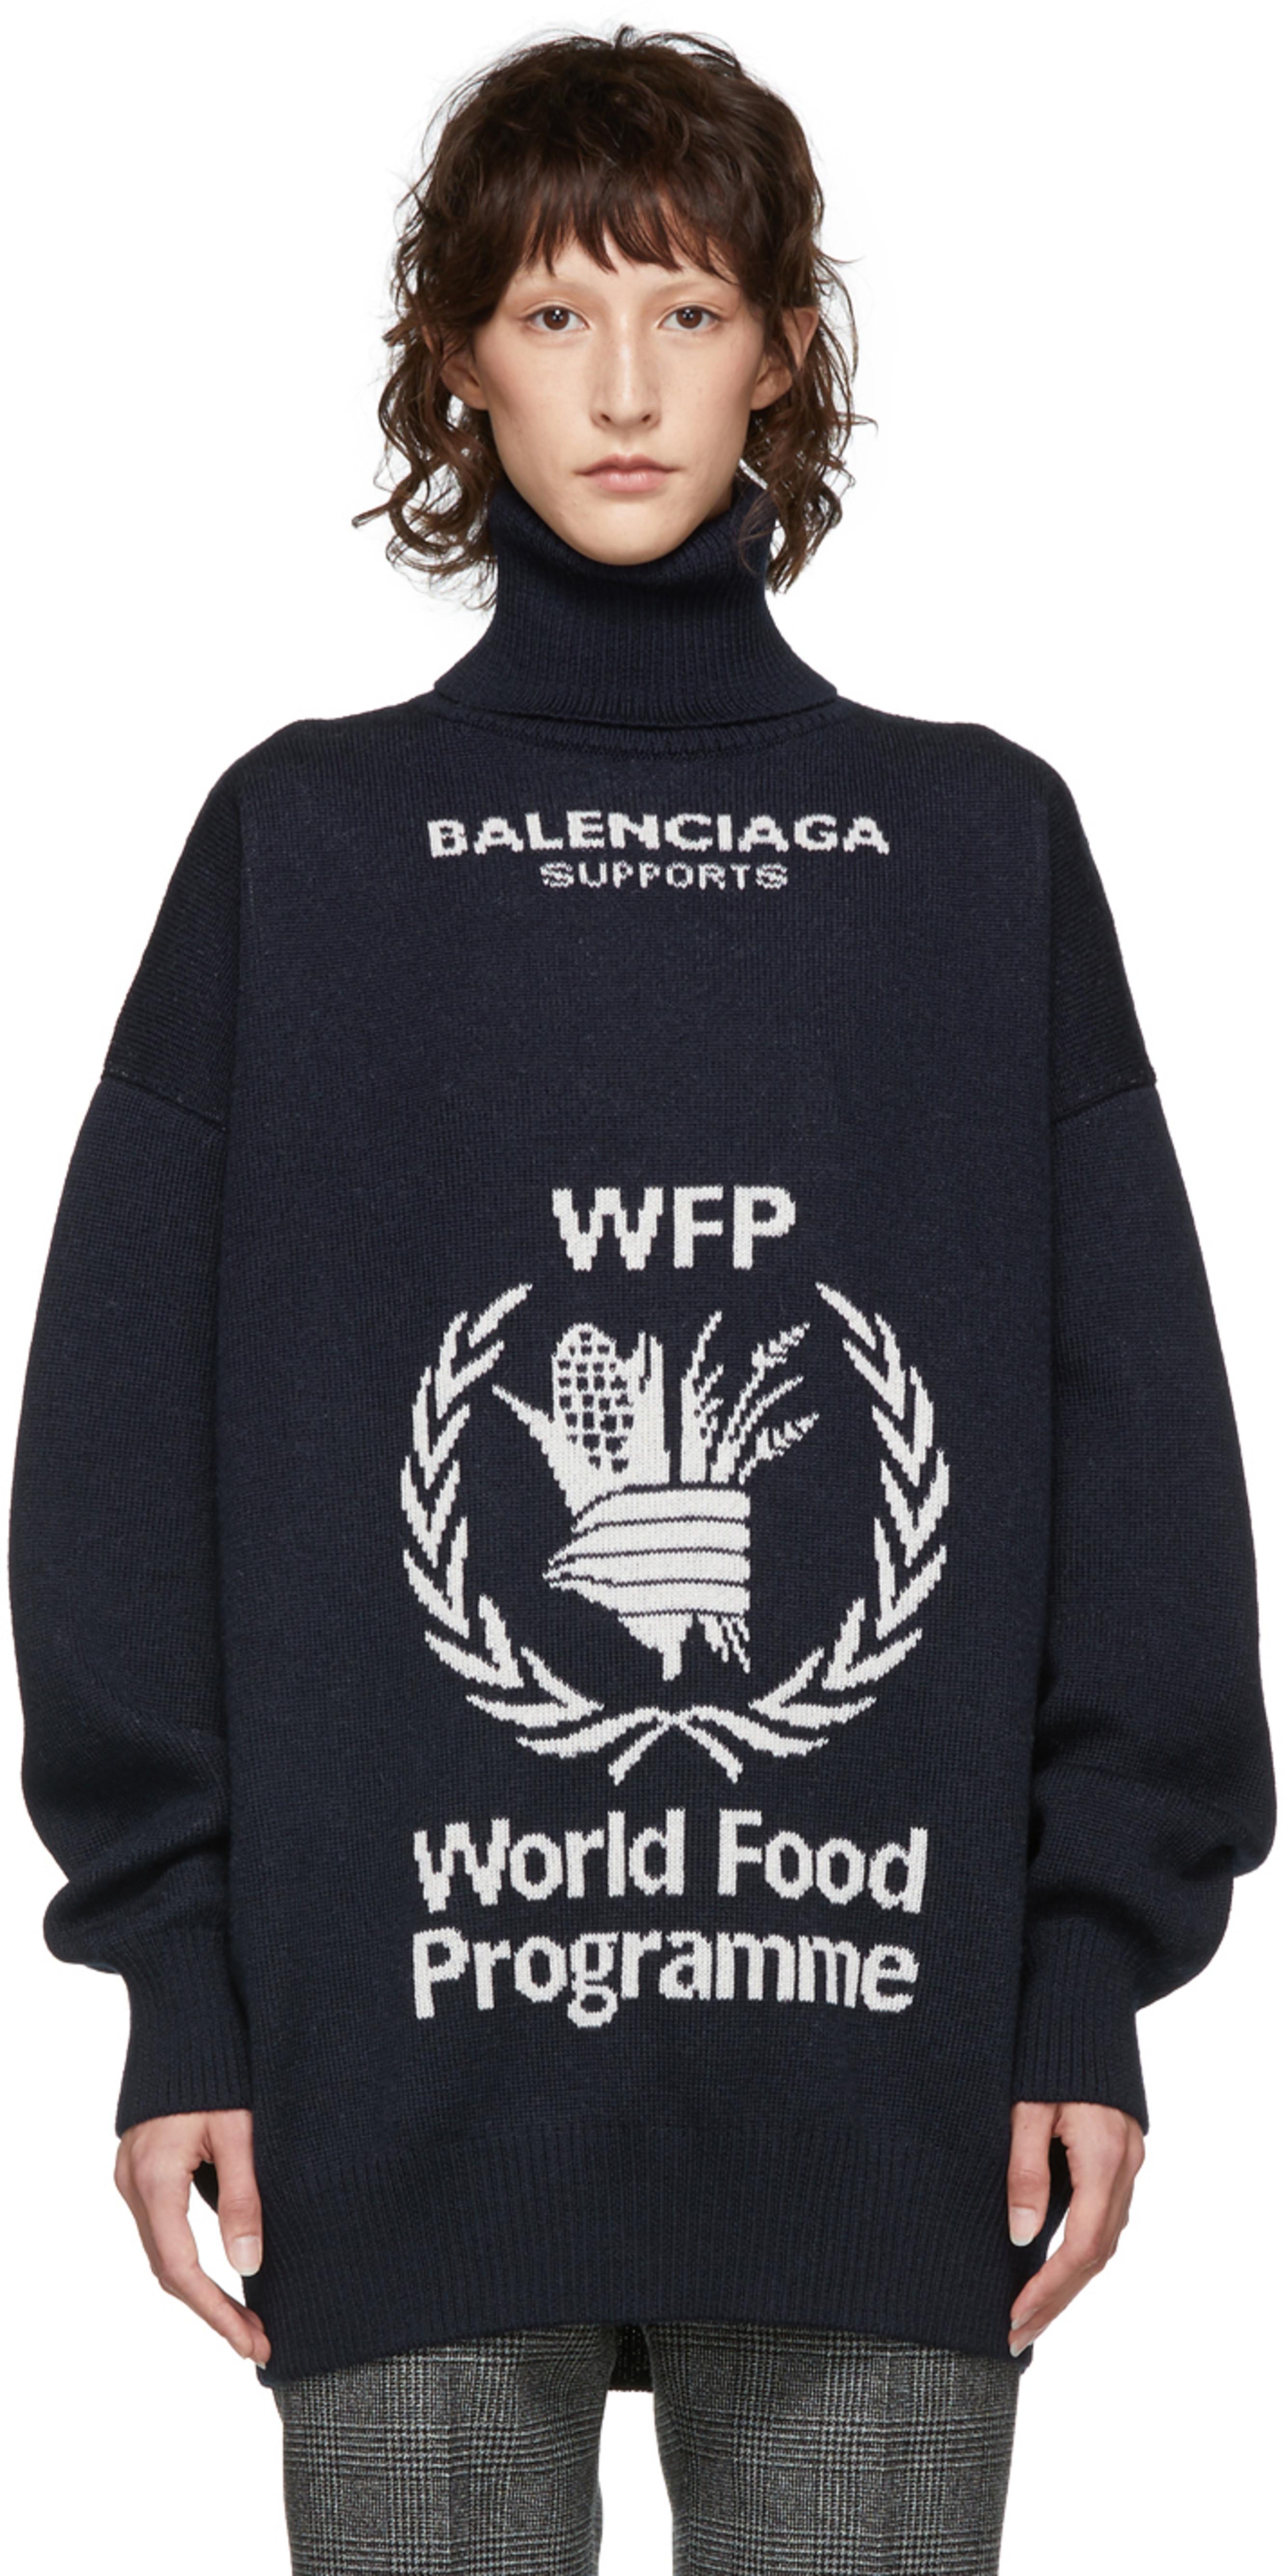 02a80ff80b52 Balenciaga sweaters for Women